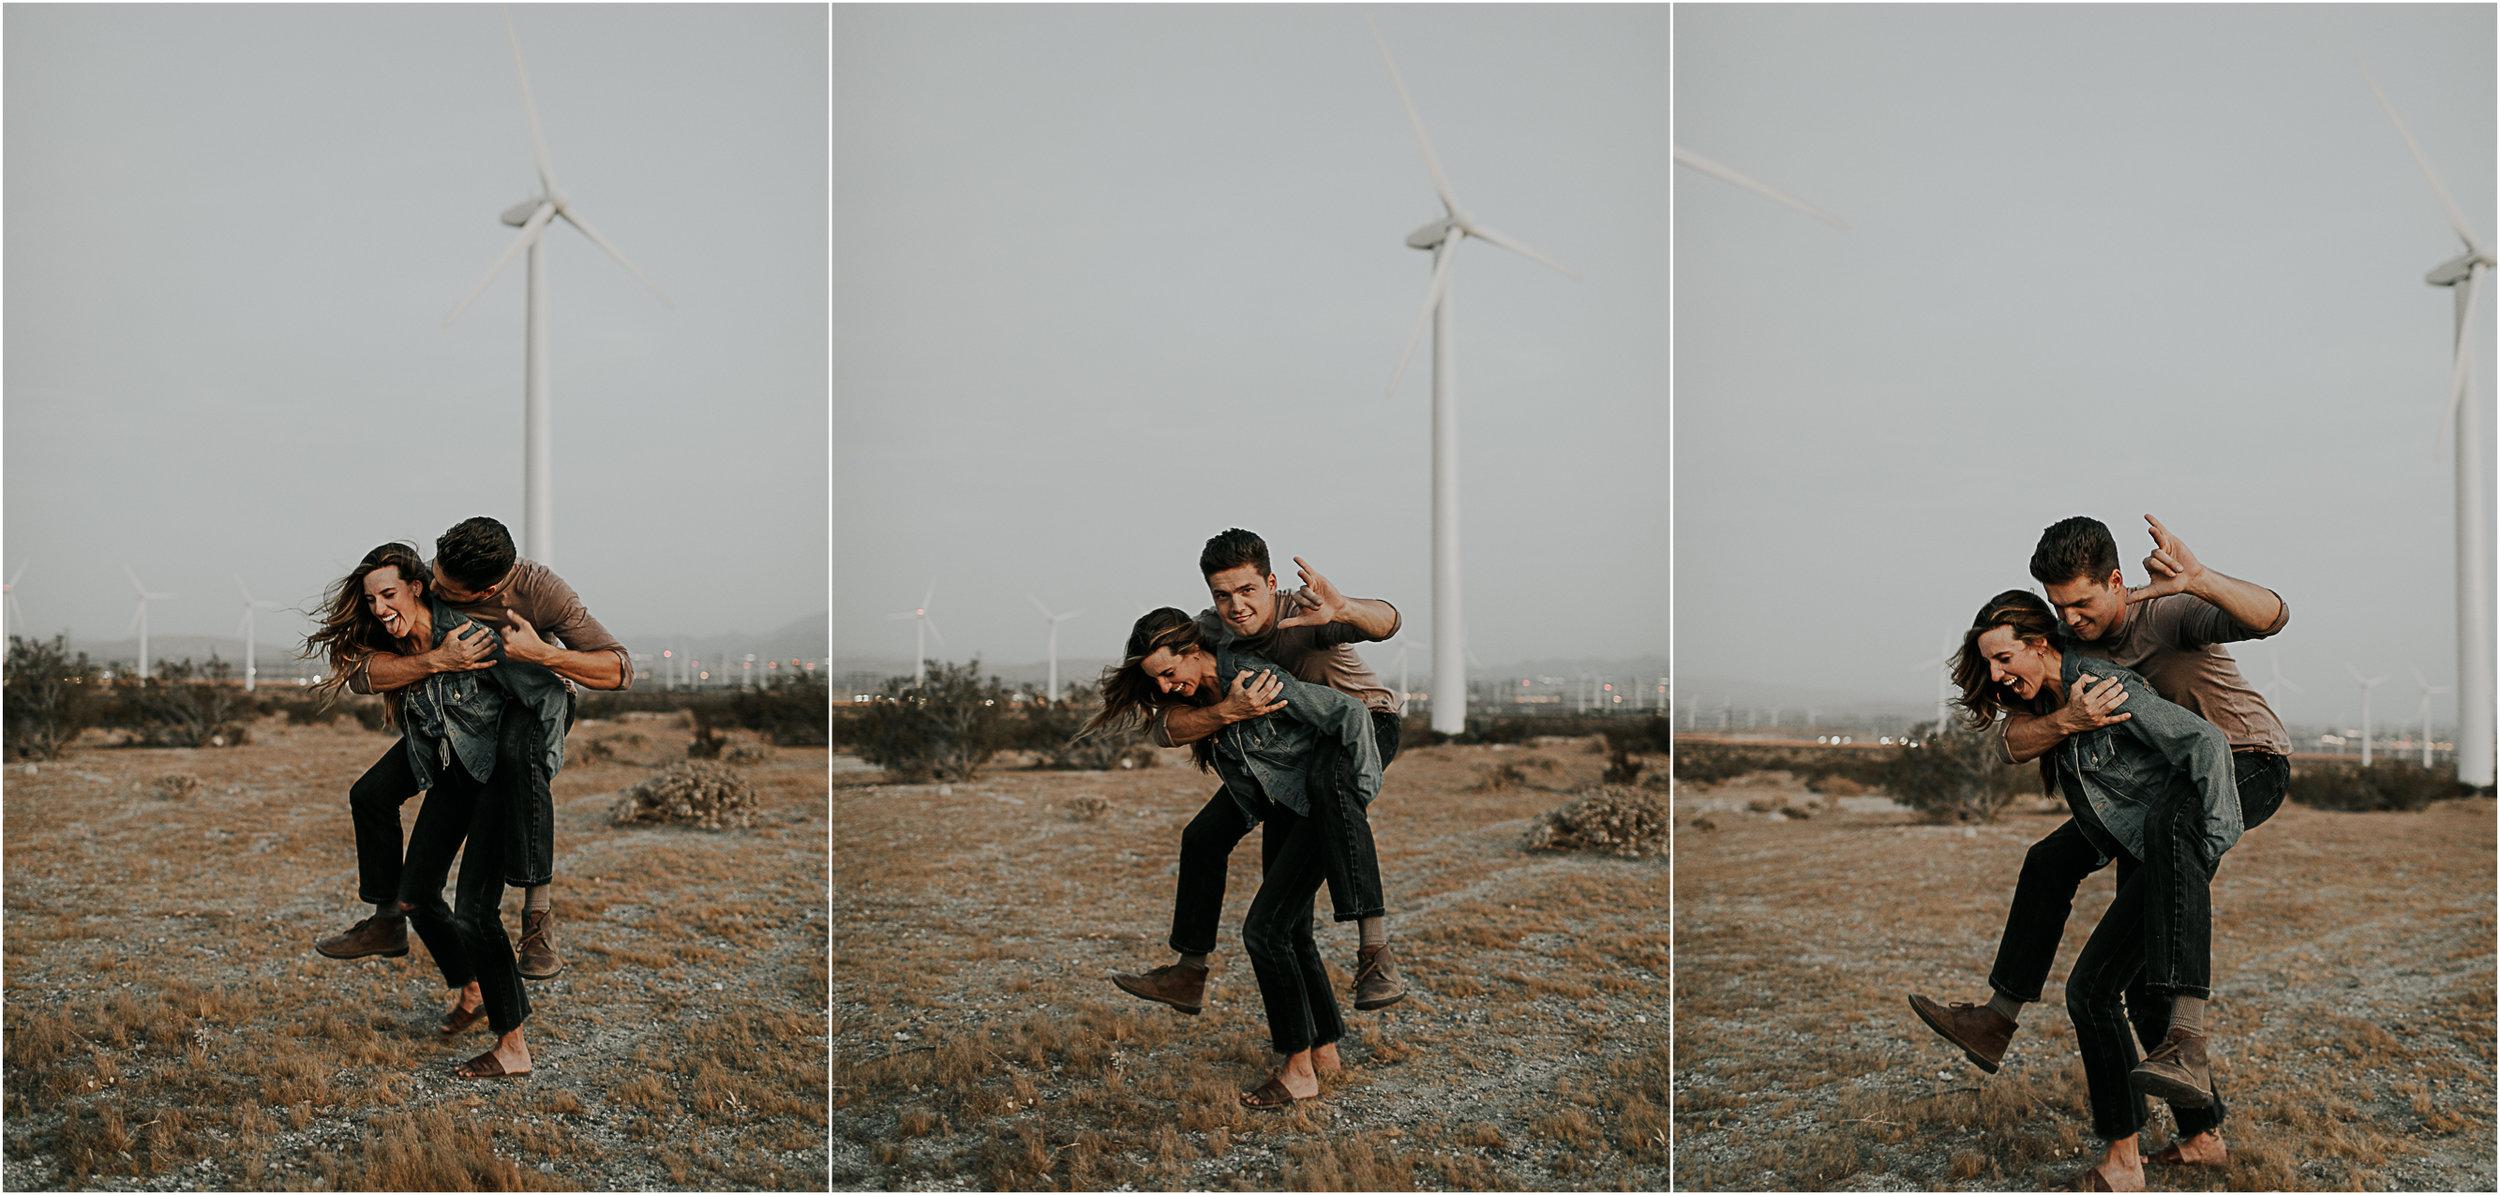 MelissaMarshall_Thrive Wildly Photography Workshop_37.jpg